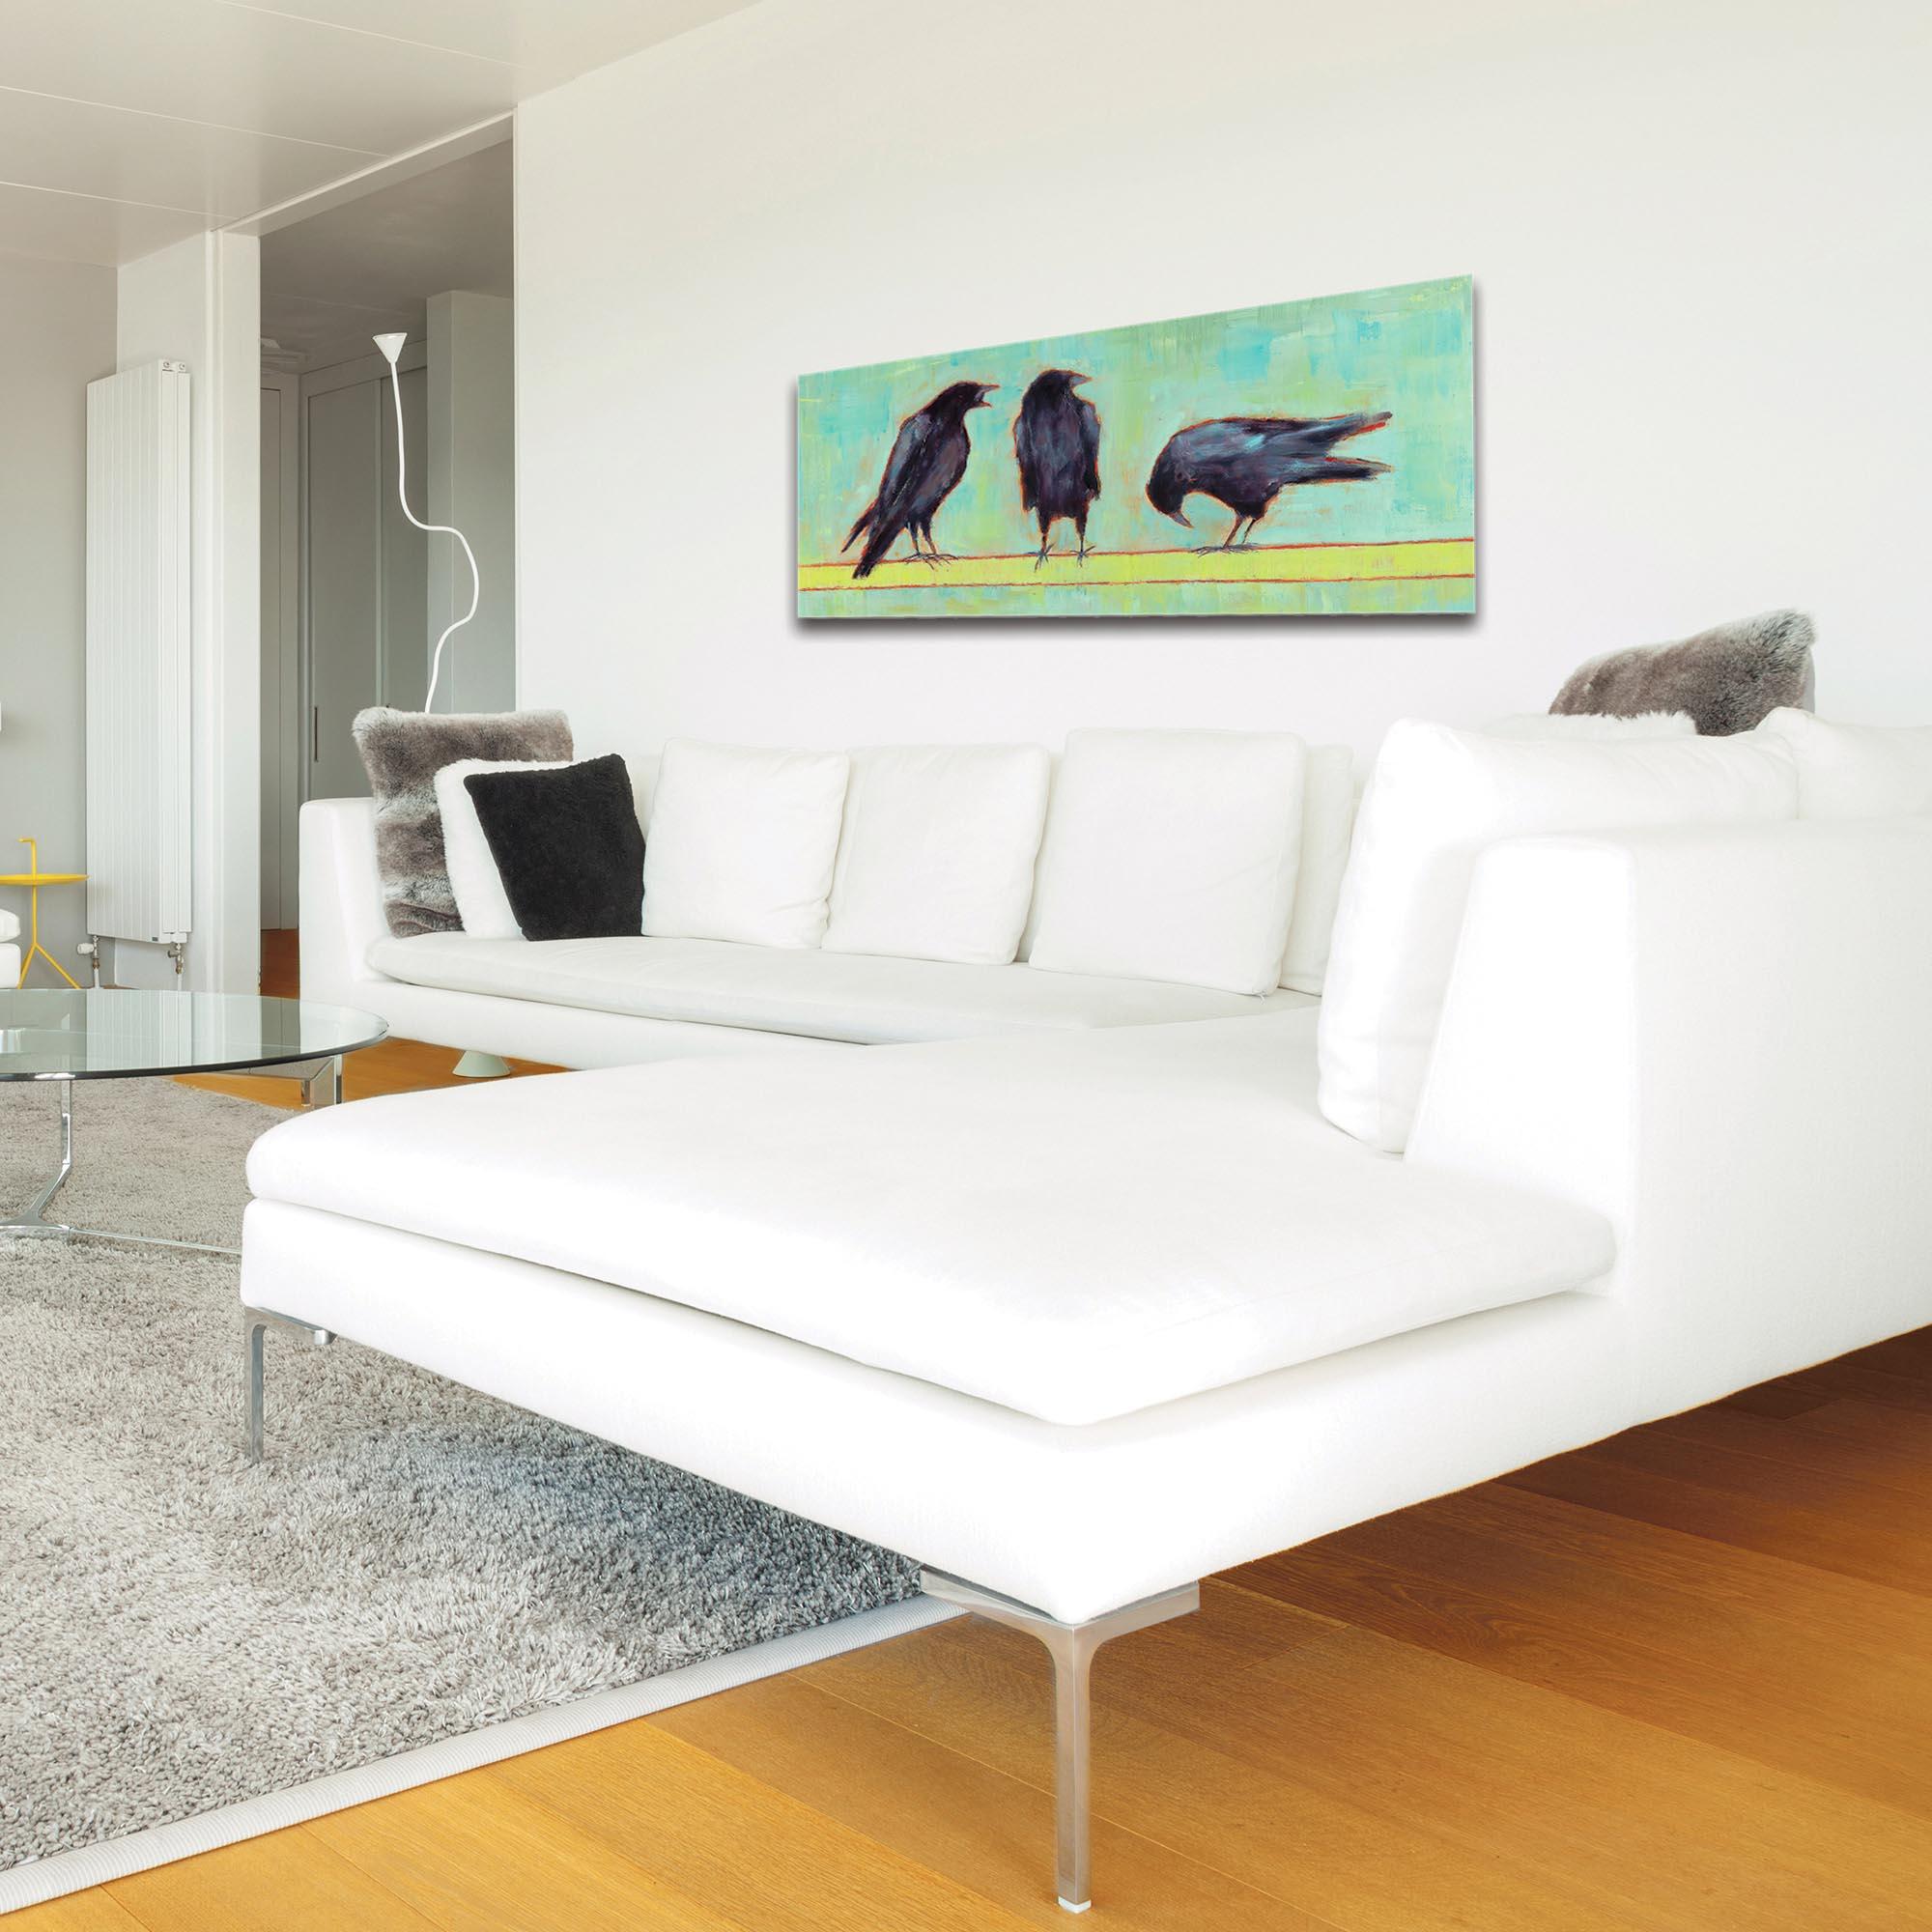 Contemporary Wall Art 'Crow Bar 1 v2' - Urban Birds Decor on Metal or Plexiglass - Image 3